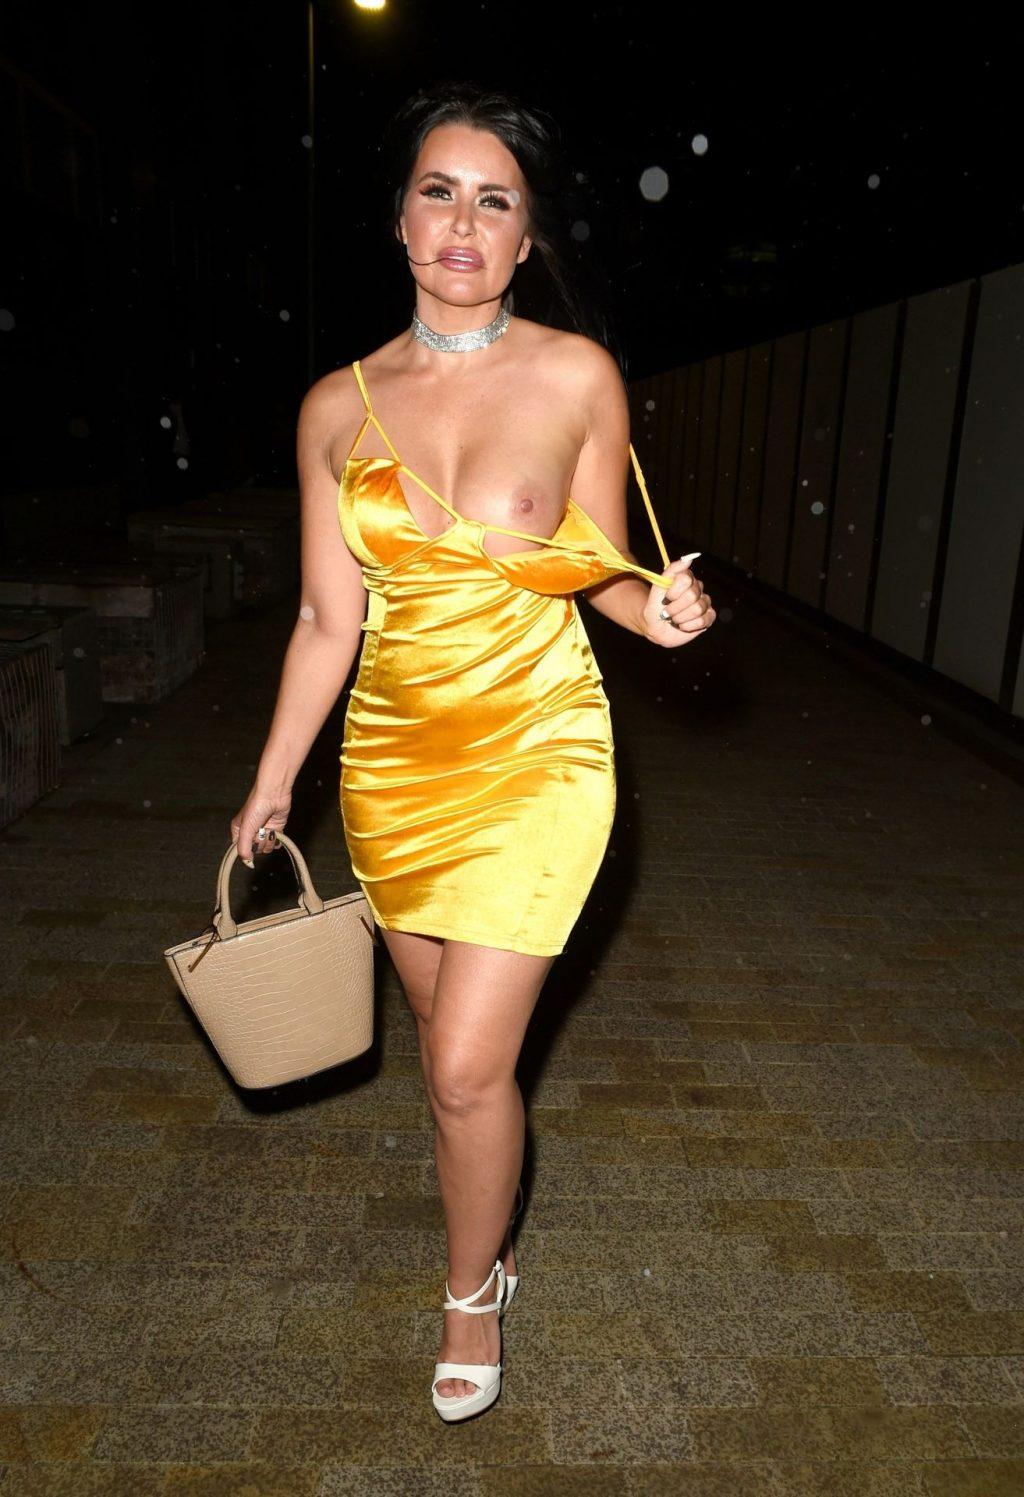 Glamour Model Sarah Longbottom Enjoys Her Nude Wild Night (20 Photos)